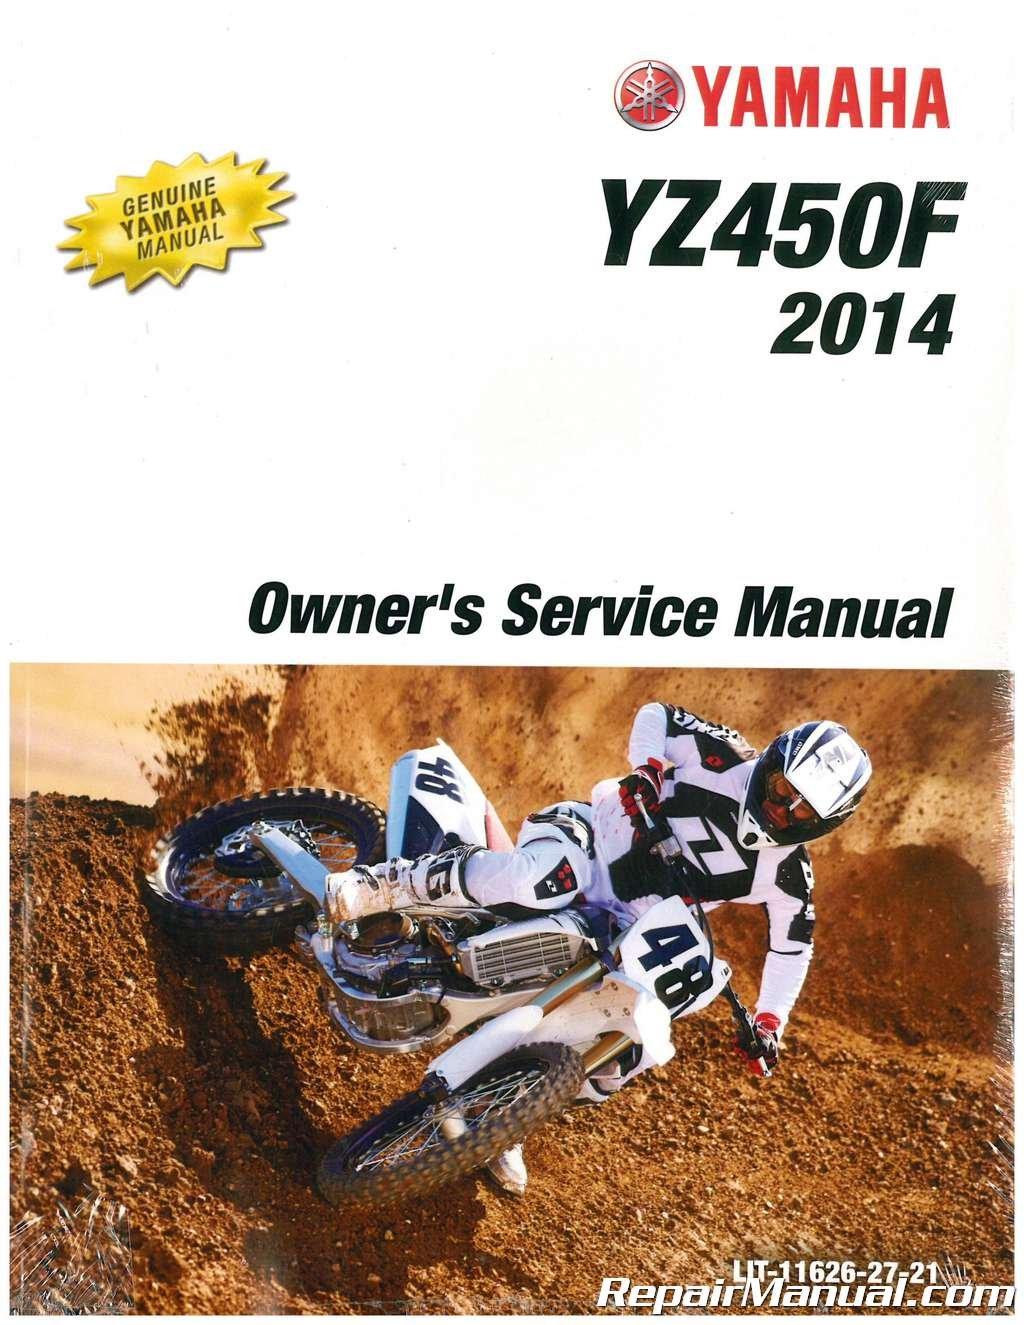 LIT-11626-27-21 2014 Yamaha YZ450F Motorcycle Owners Service Manual:  Manufacturer: Amazon.com: Books